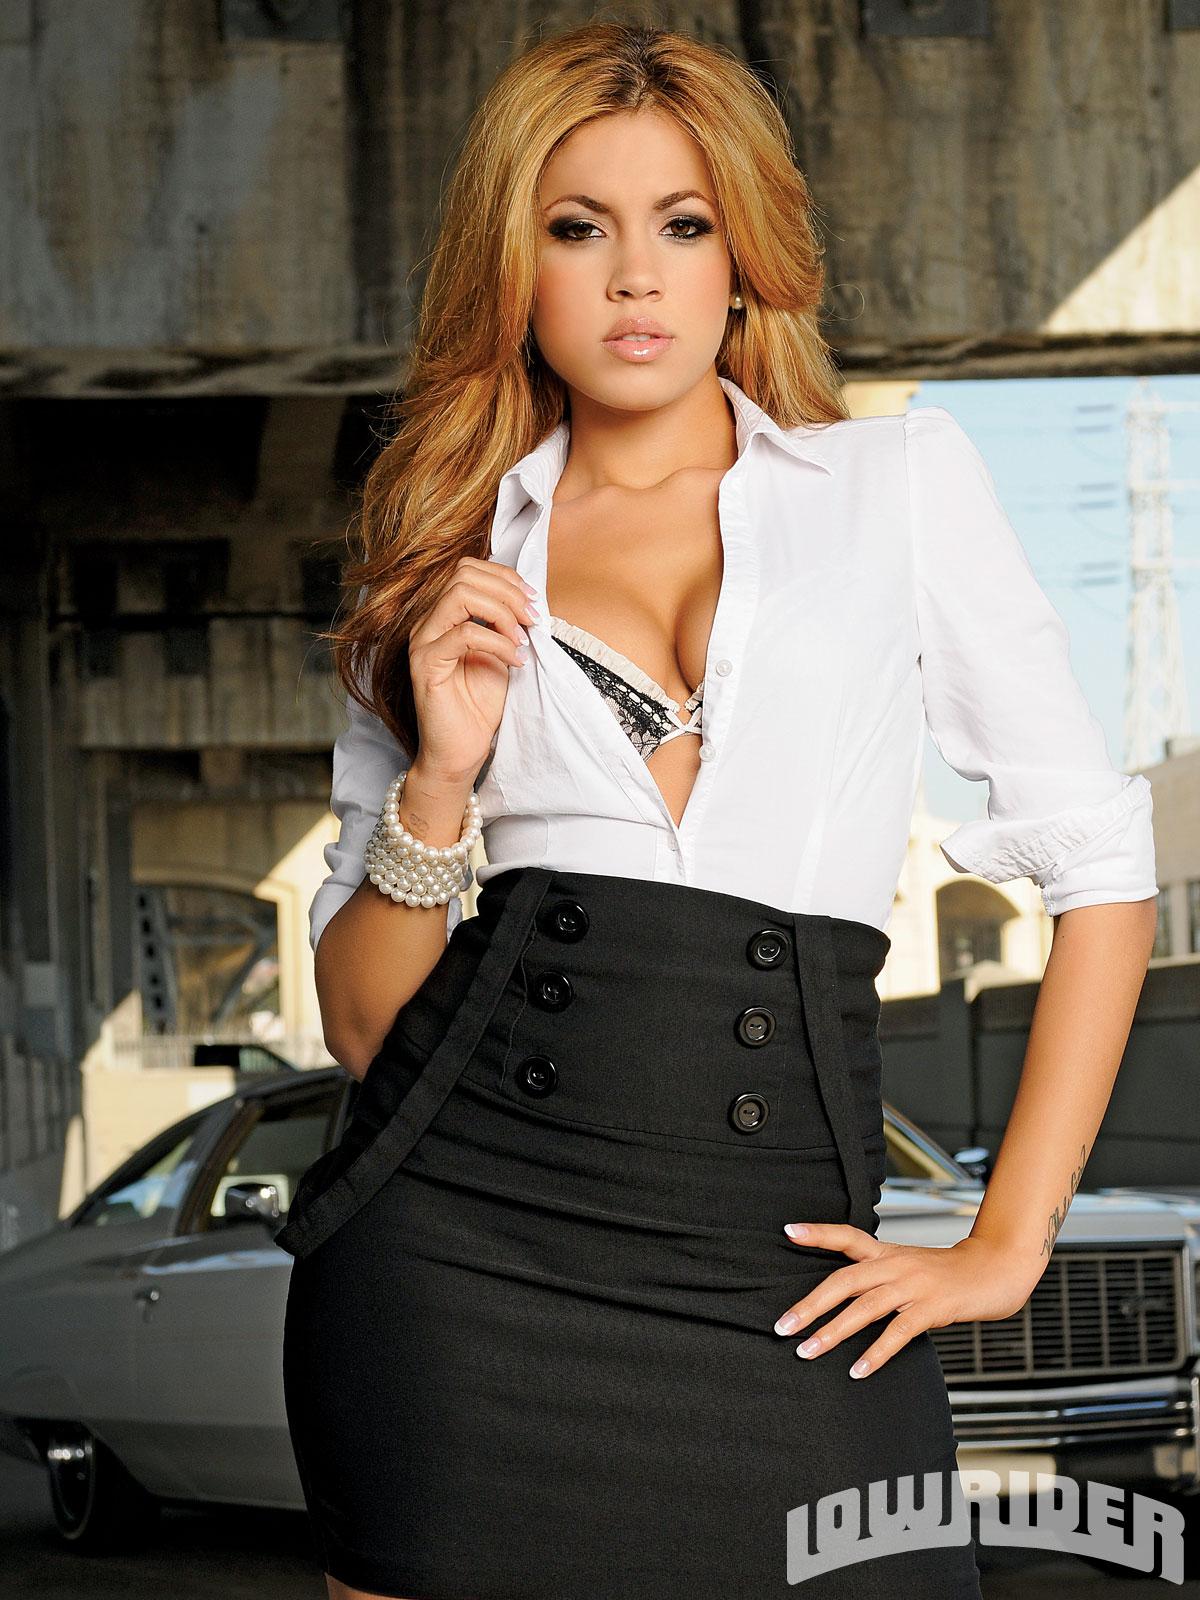 Isis Taylor Lowrider Girls Model Lowrider Girls Magazine